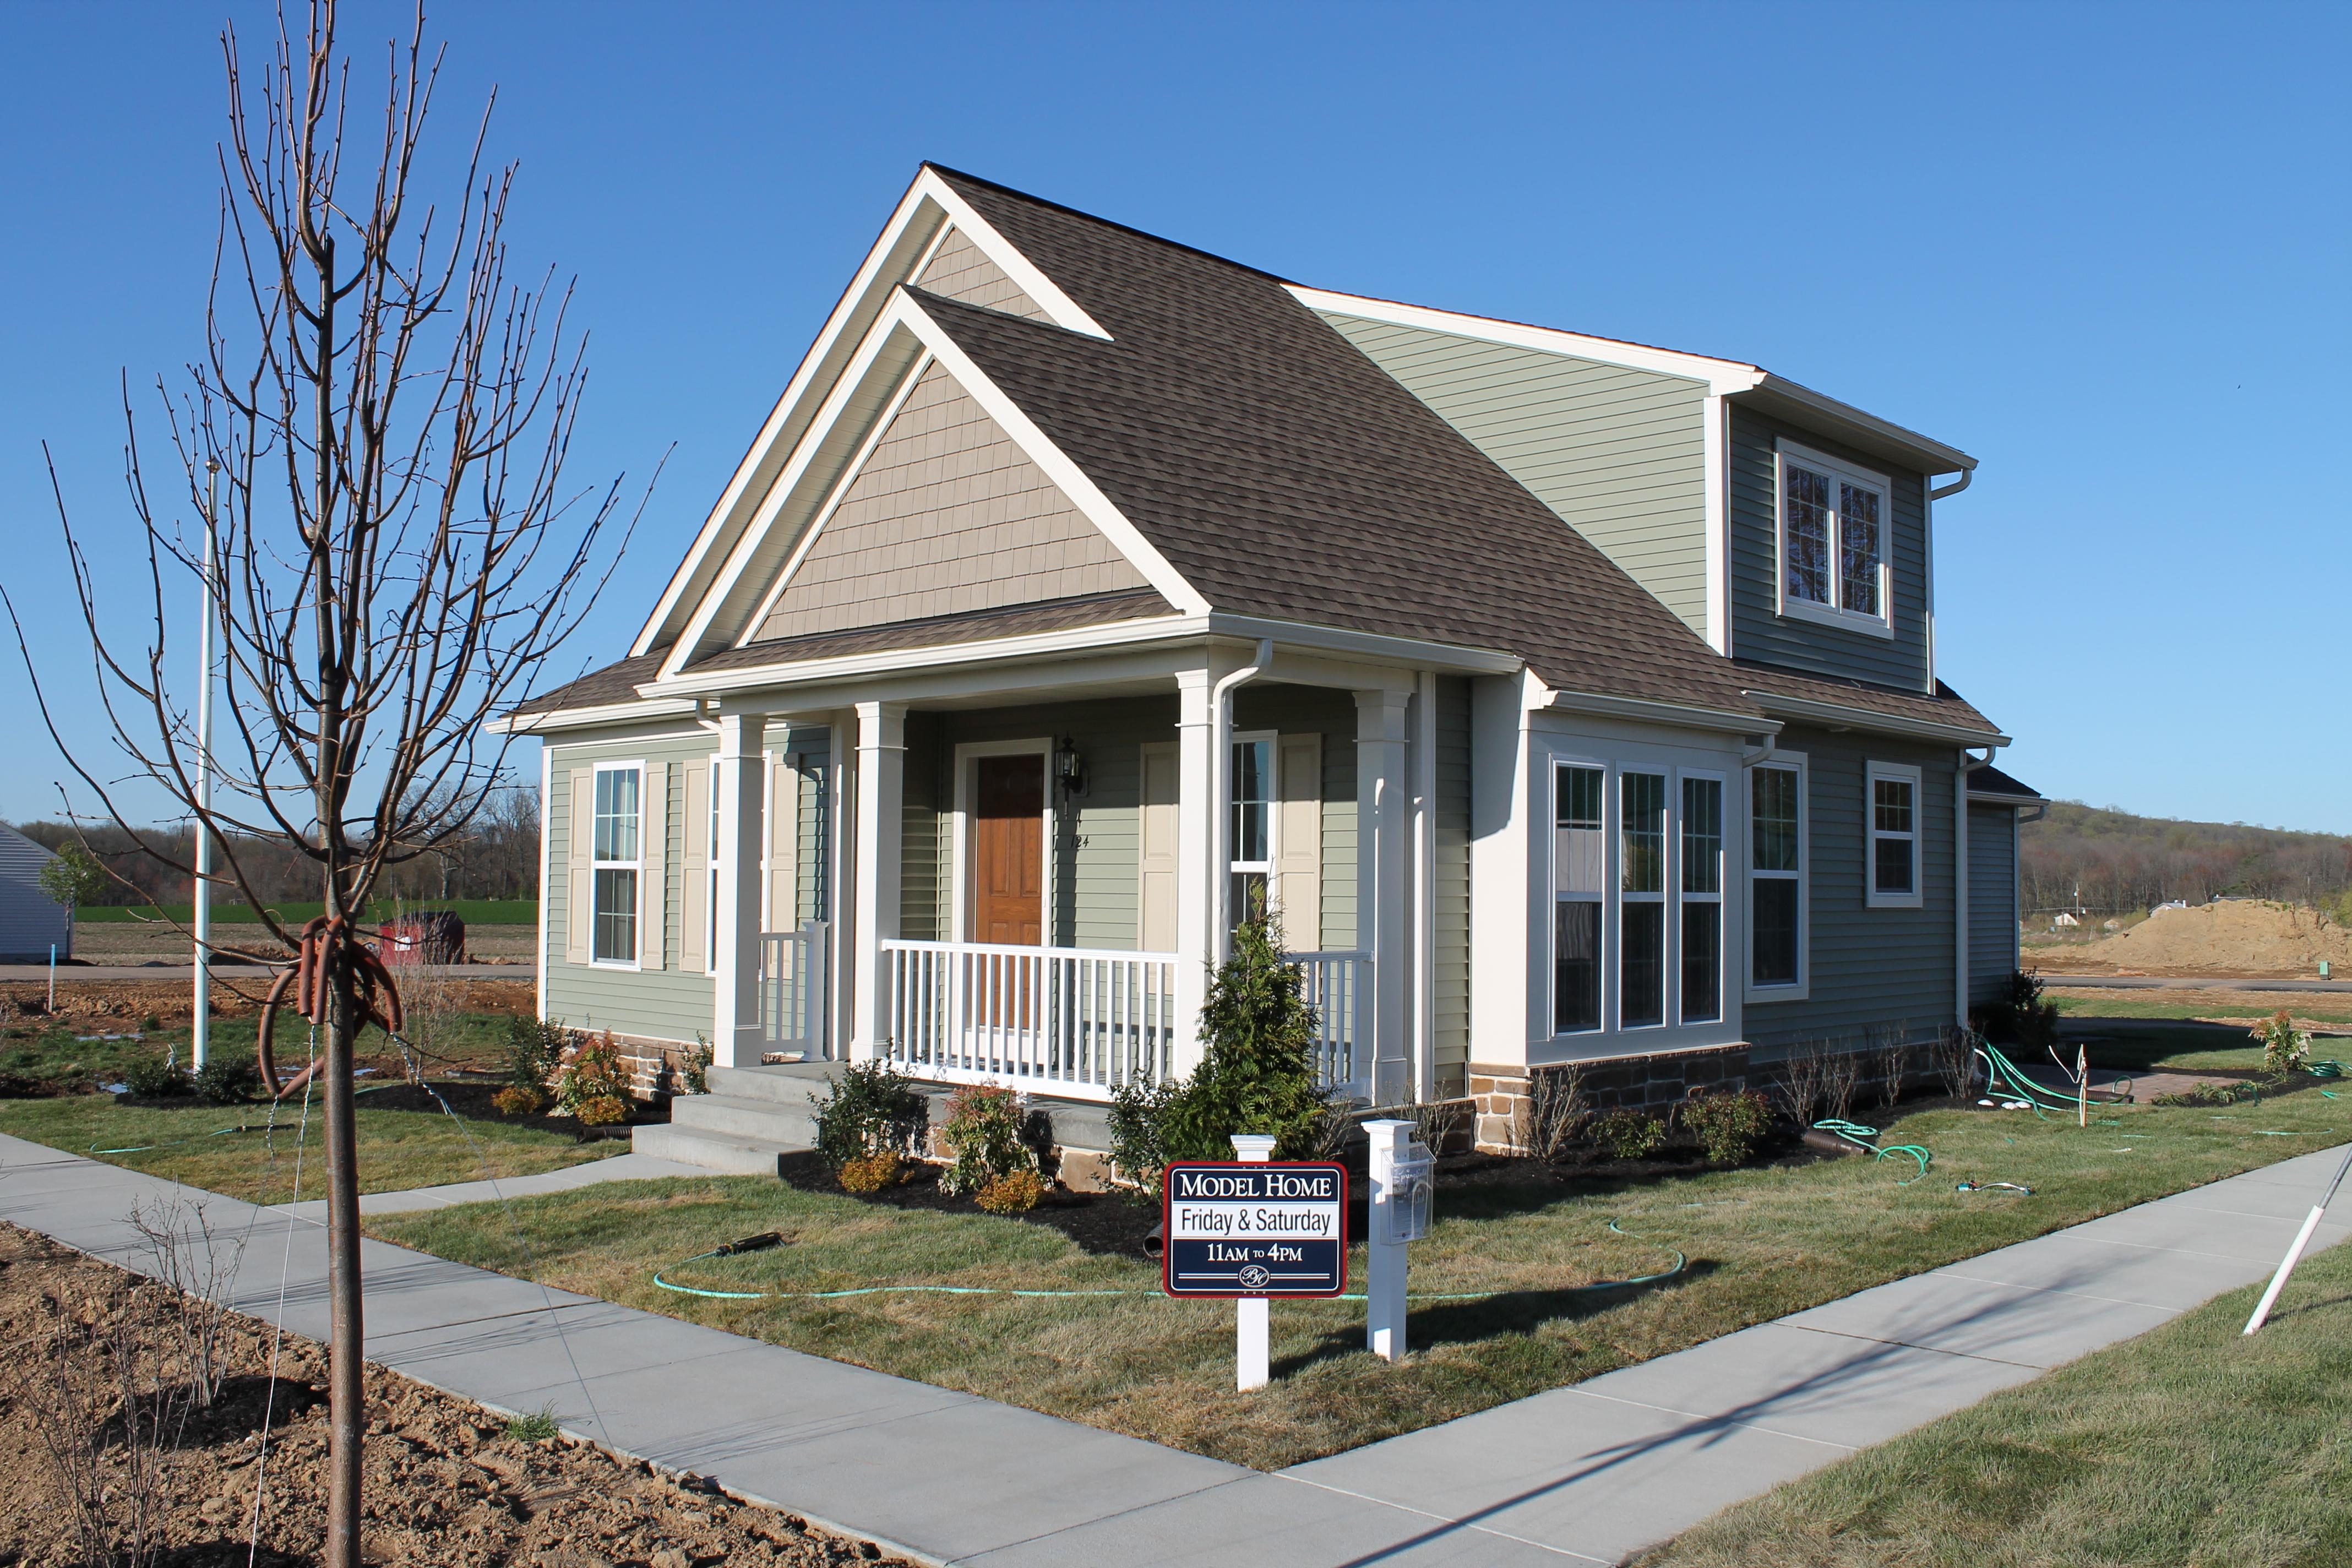 Berks homes 3335 morgantown rd mohnton pa home builders for Home builders com